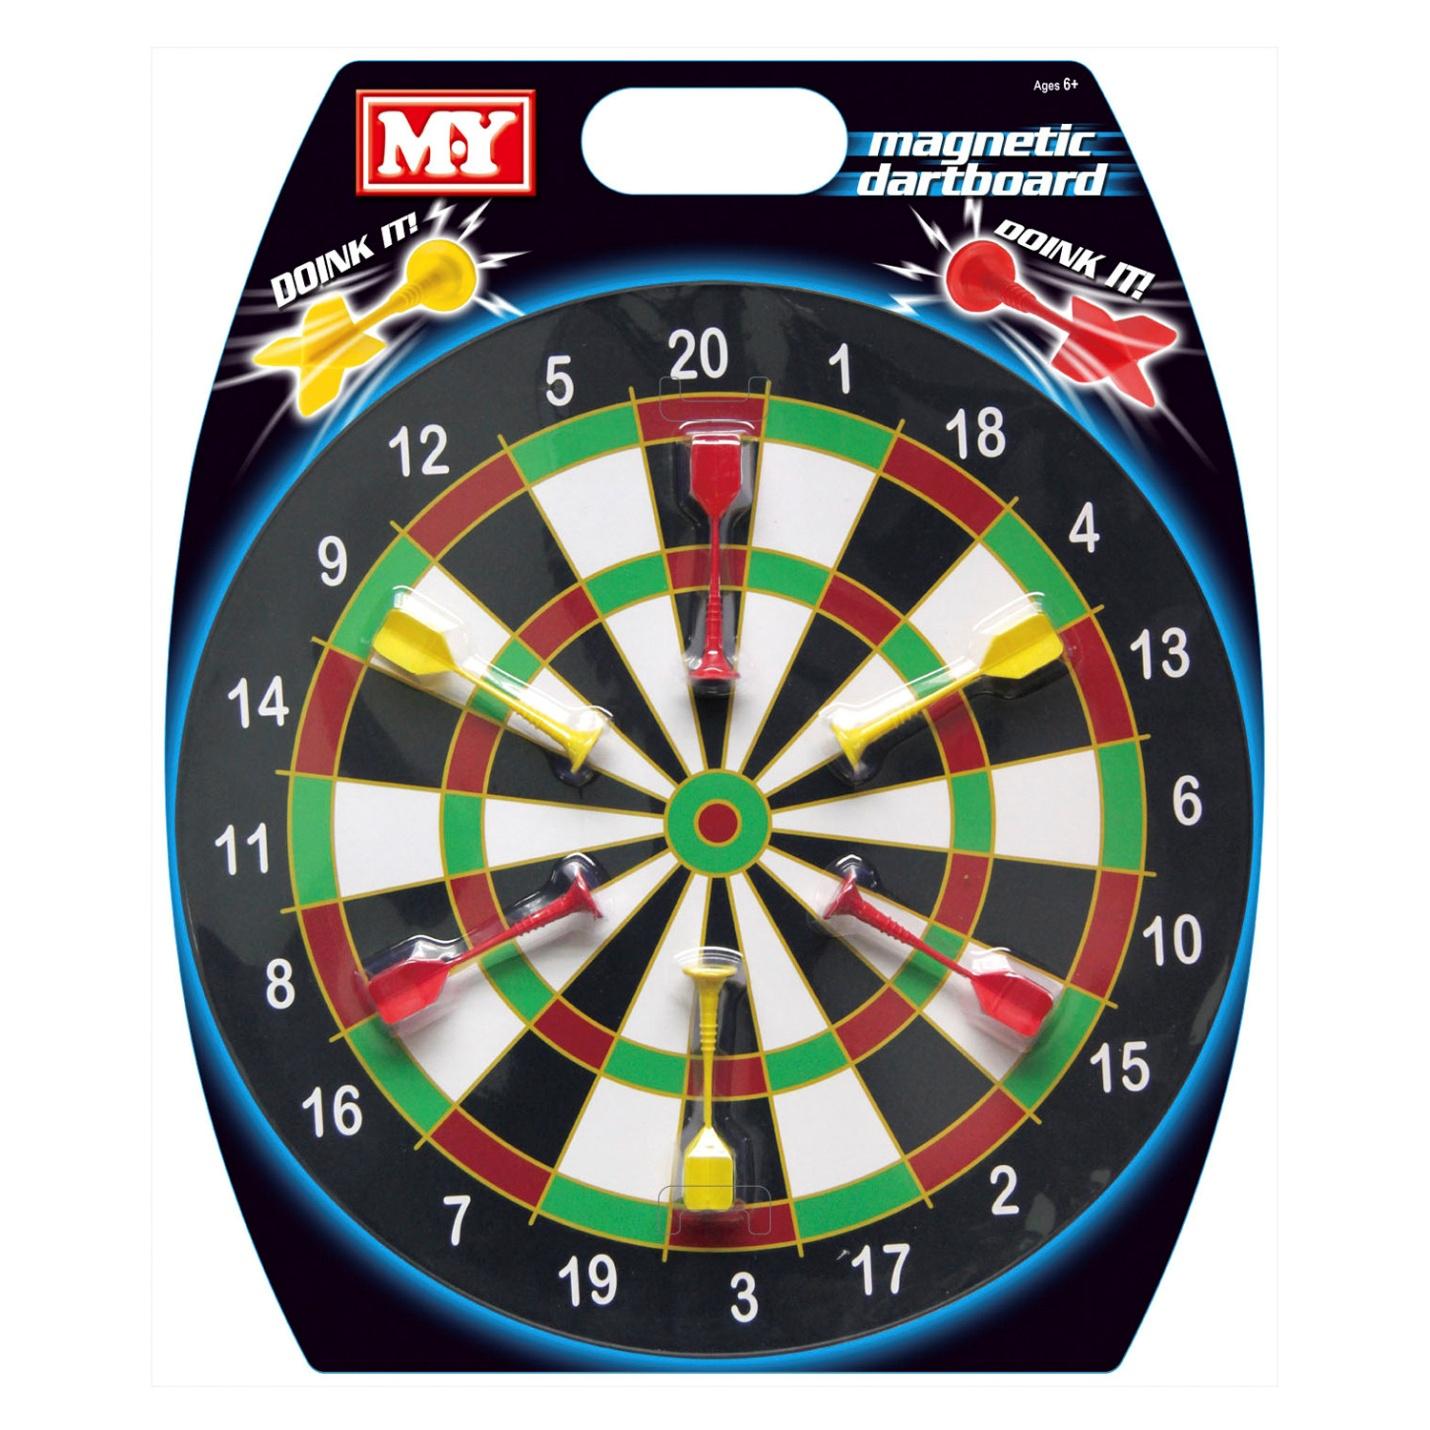 Magnetic dartboard.jpg